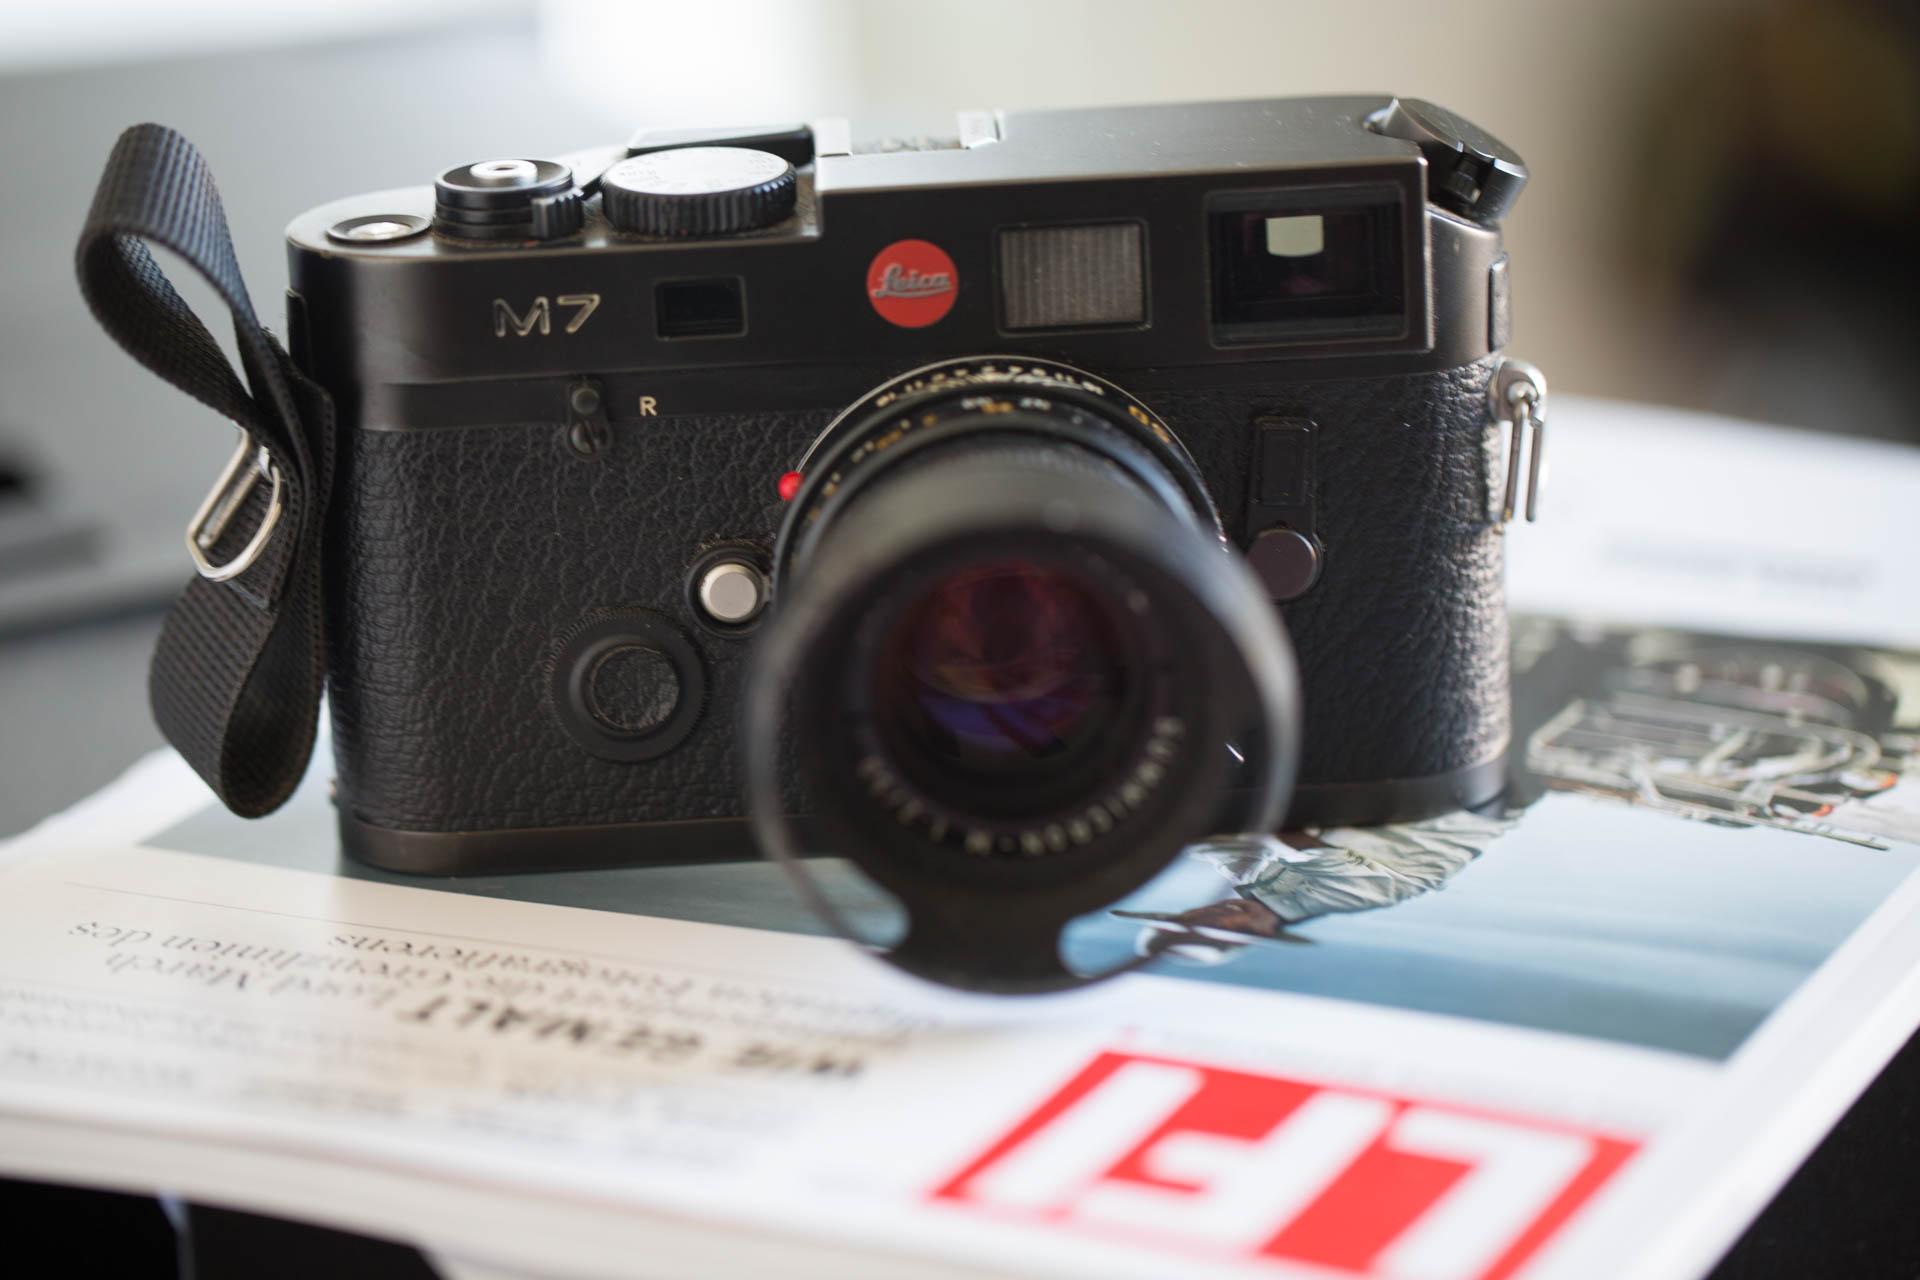 leicafotograf dresden Leica M7